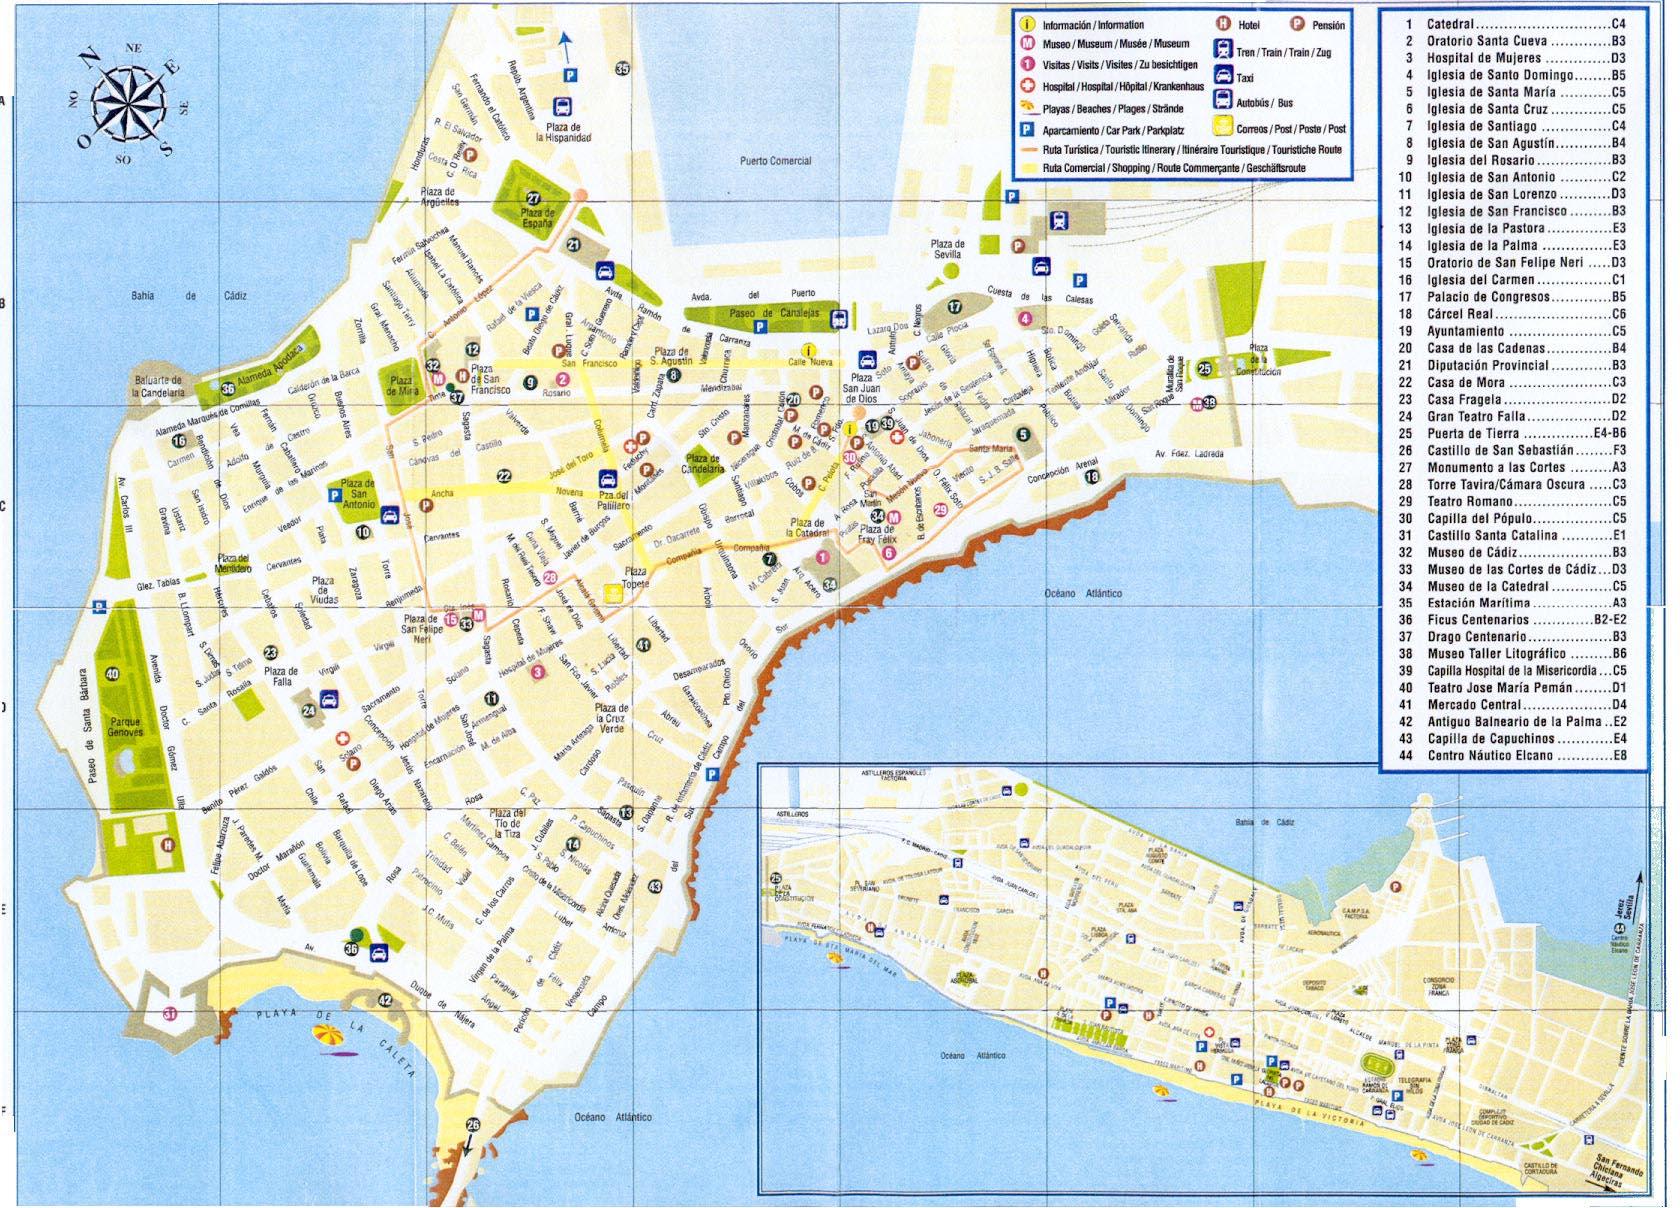 Mapa turístico de la ciudad de Cádiz